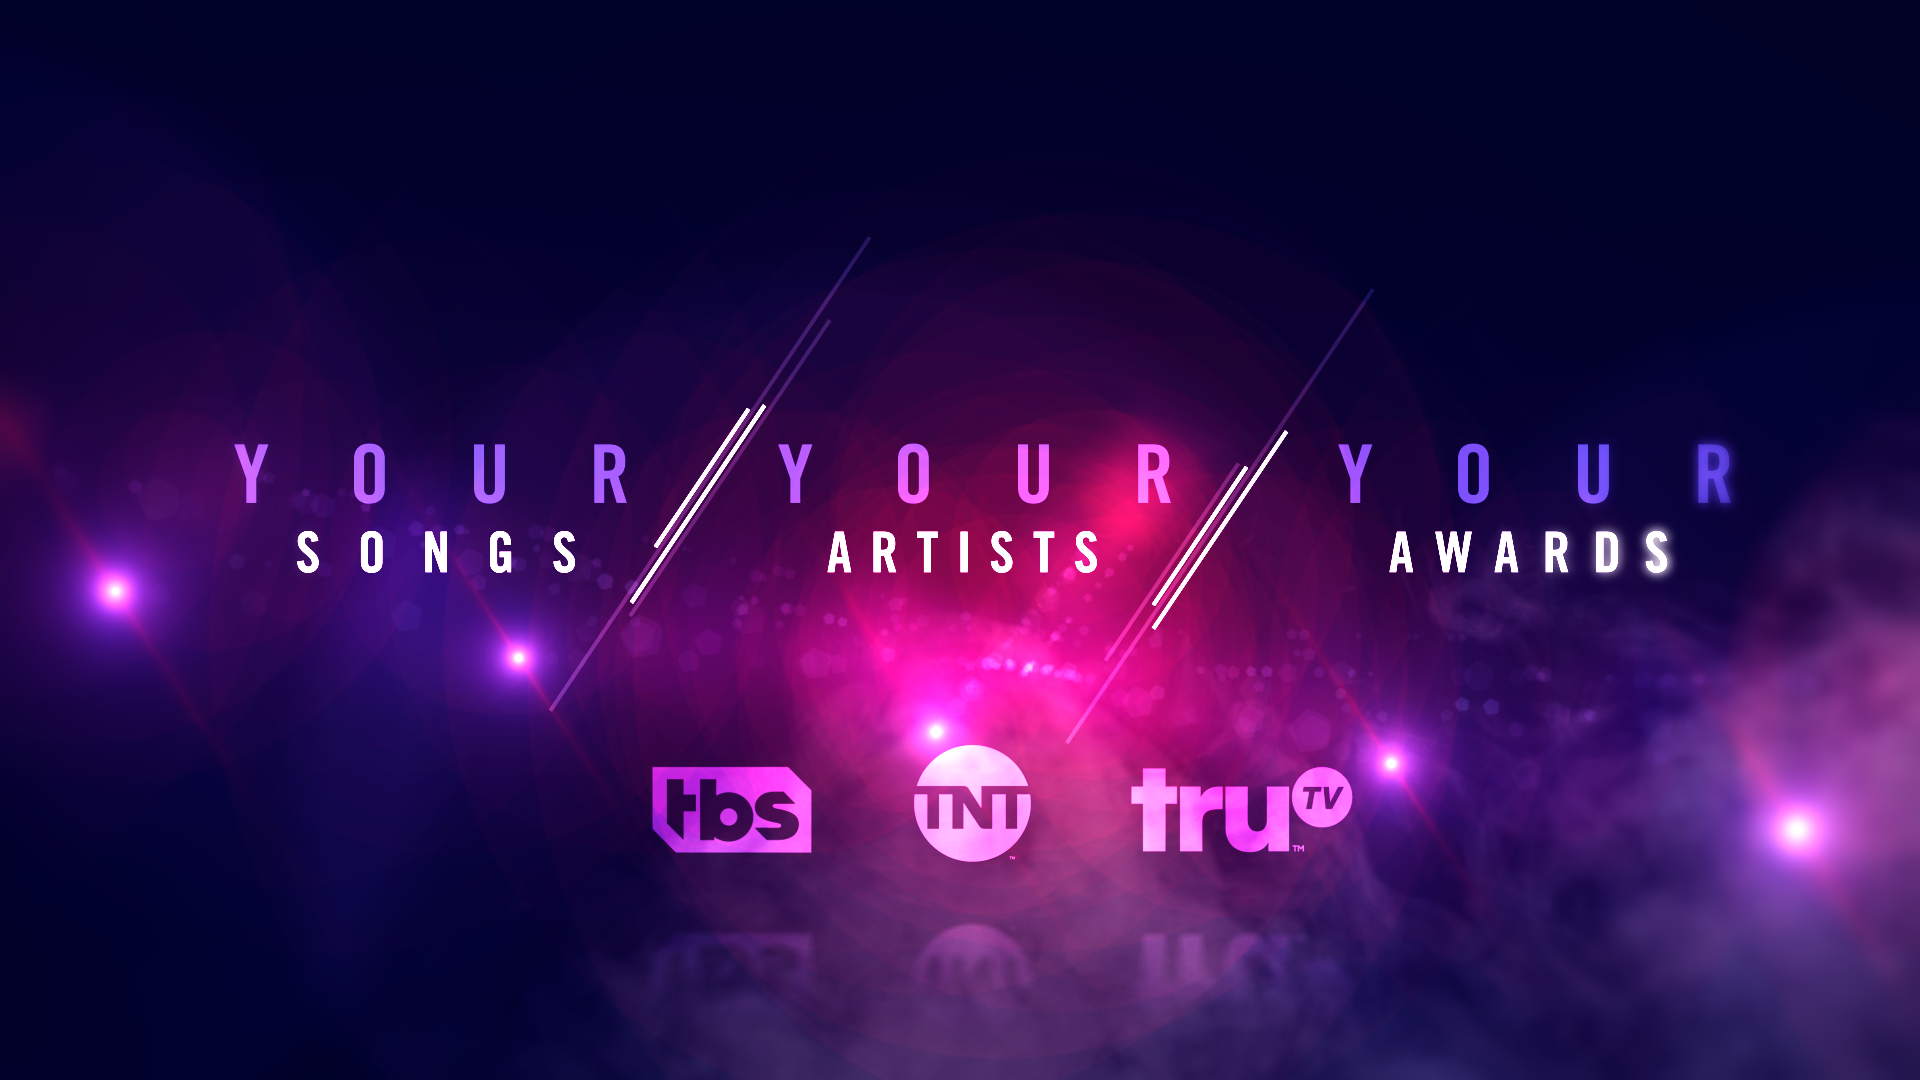 04_TBS_iHeart_LogoLockups.png